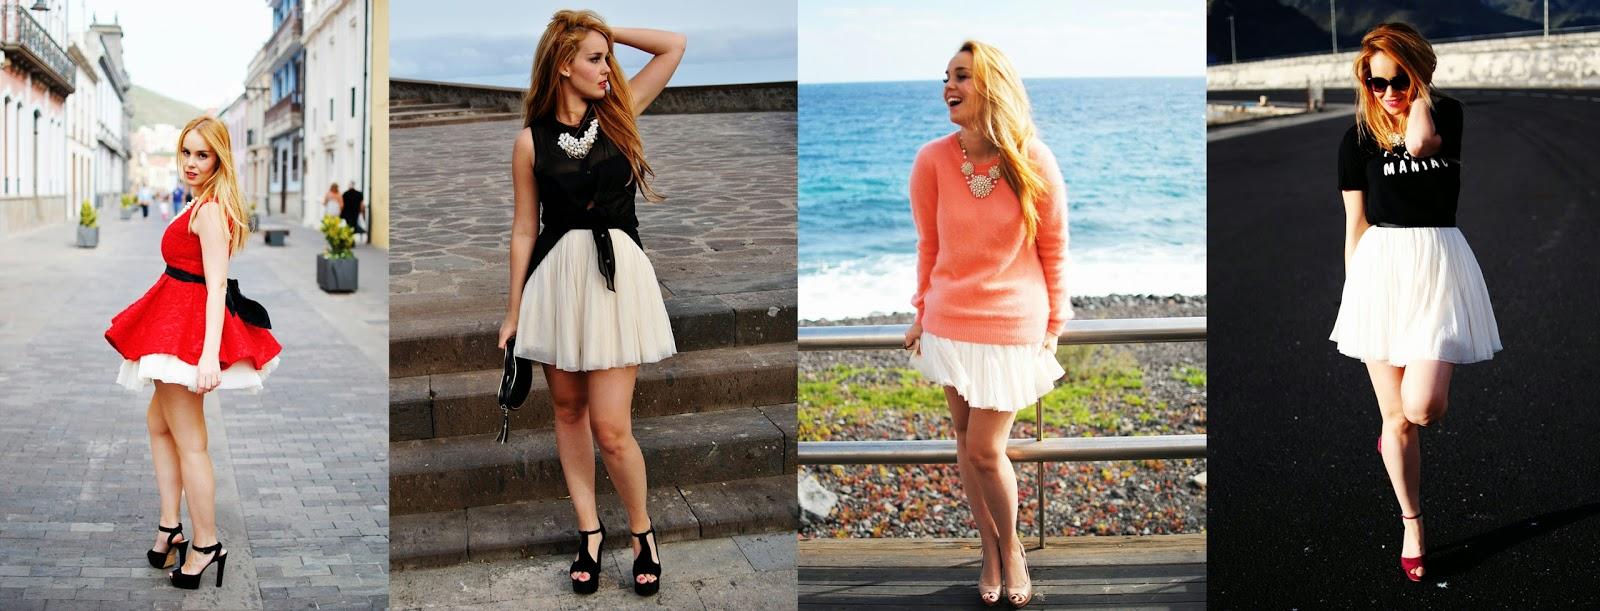 nery hdez, white tutu, tutu, tuú girl, blonde , bloguera de tenerife